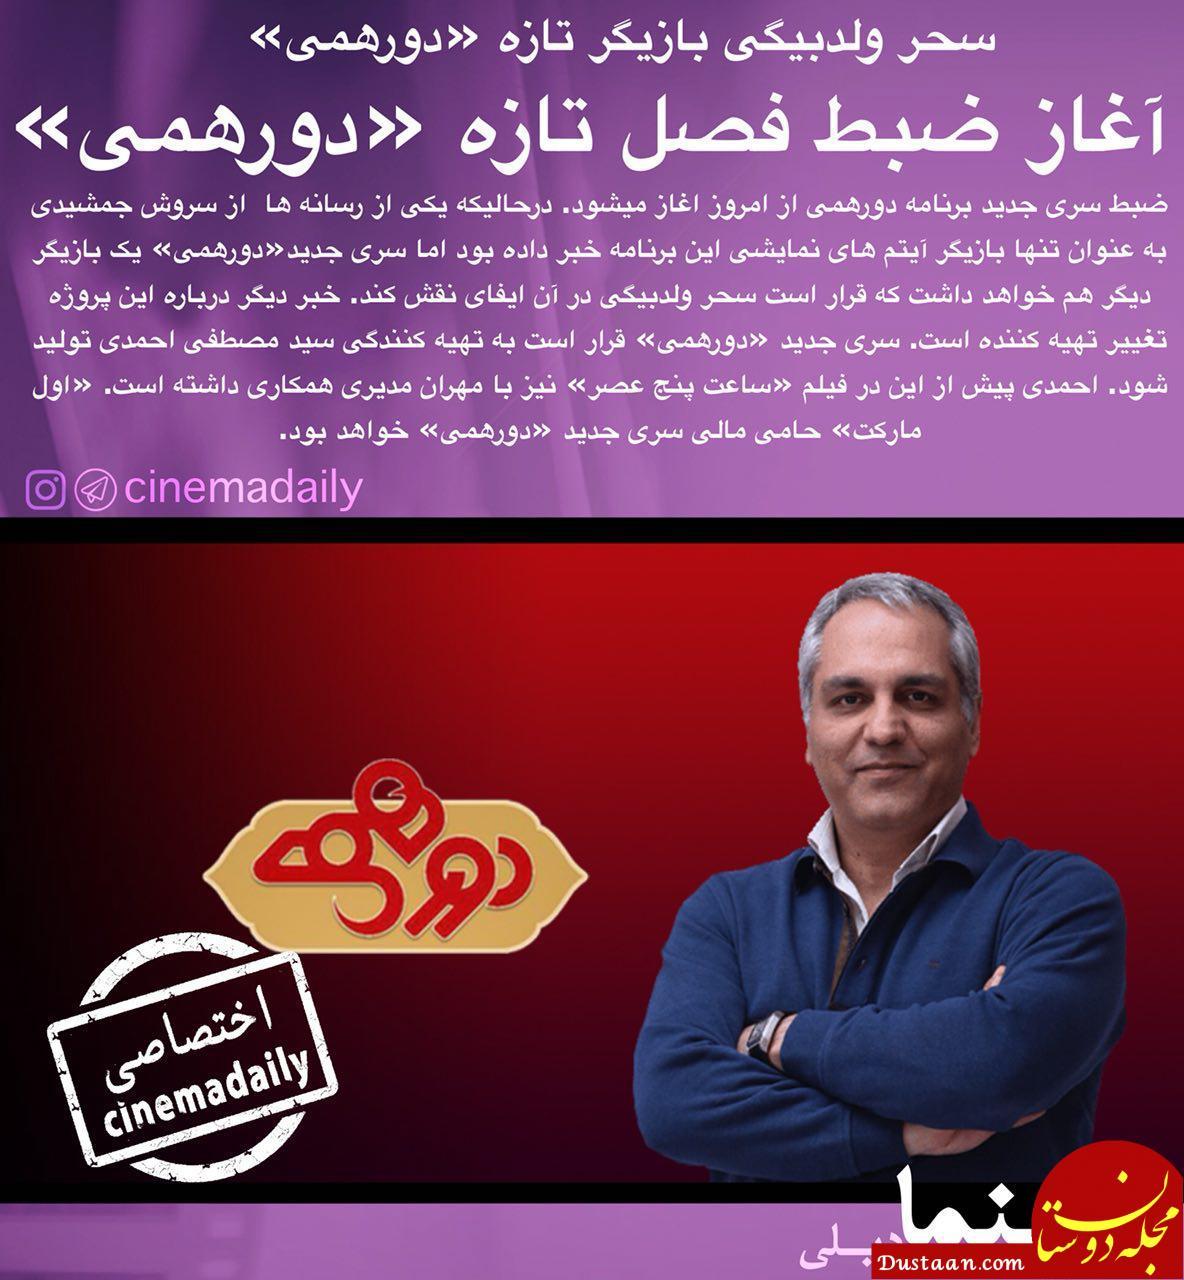 www.dustaan.com سحر ولدبیگی بازیگر جدید دورهمی شد +عکس